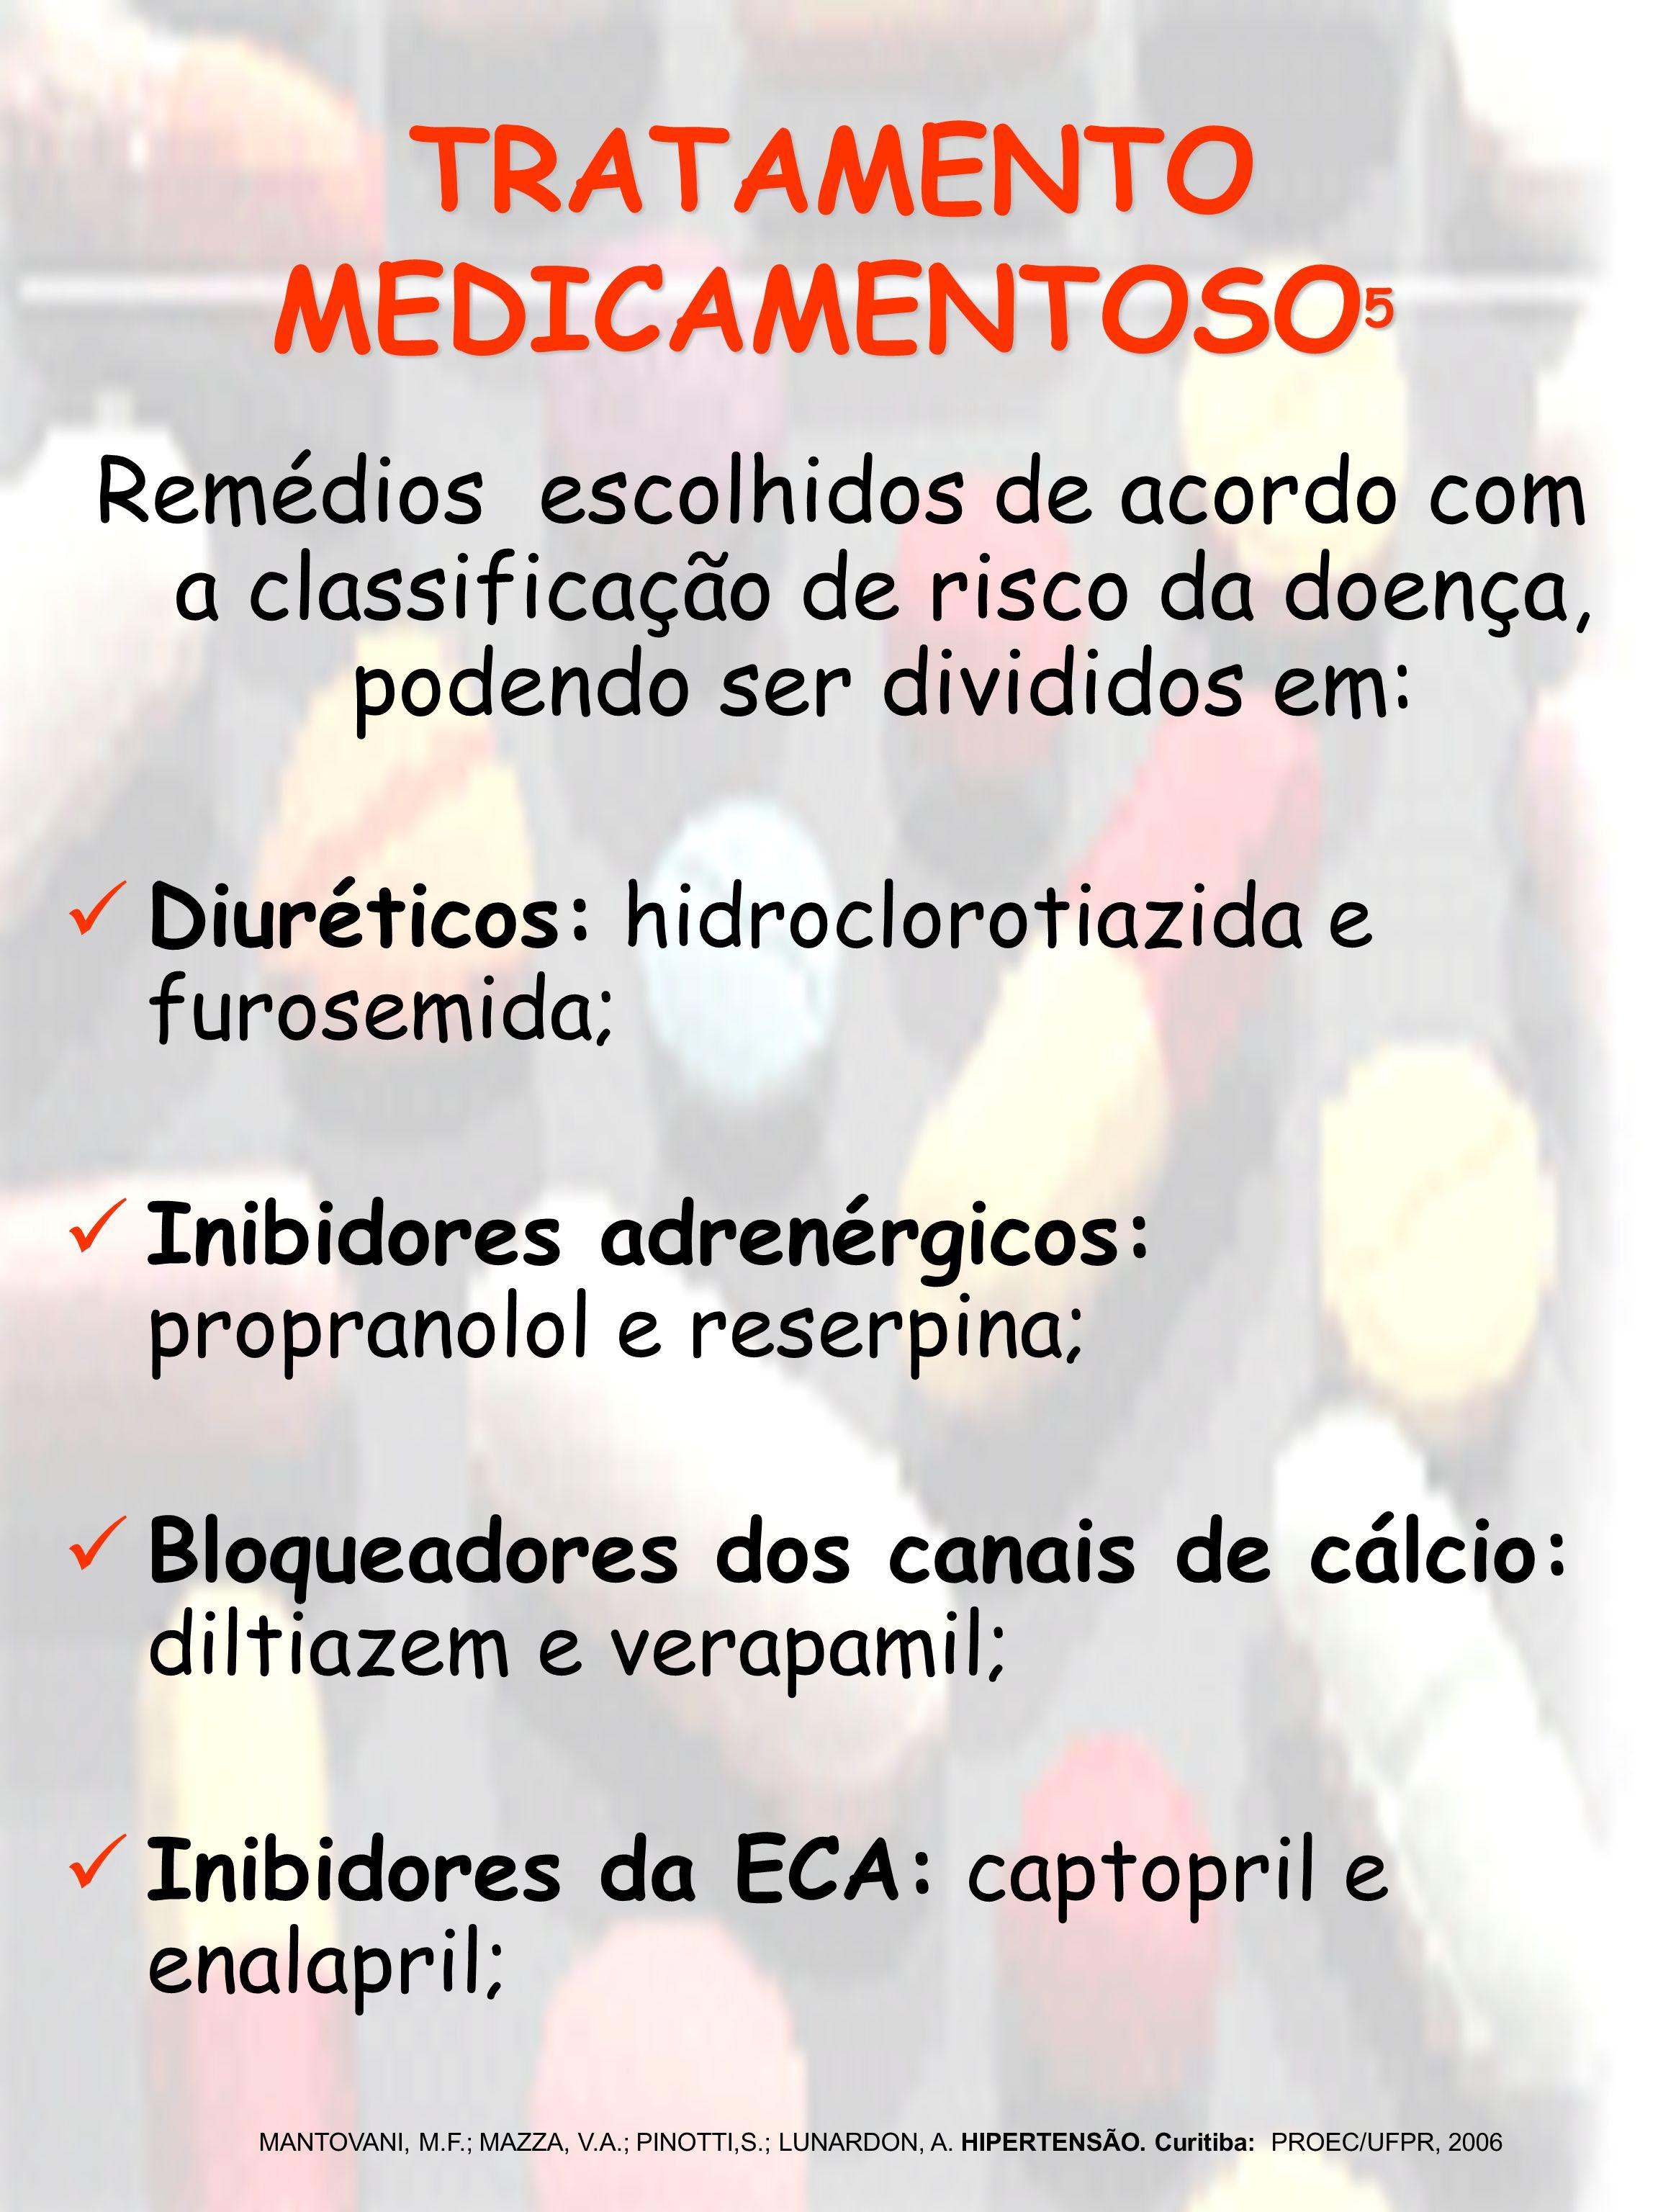 TRATAMENTO MEDICAMENTOSO5